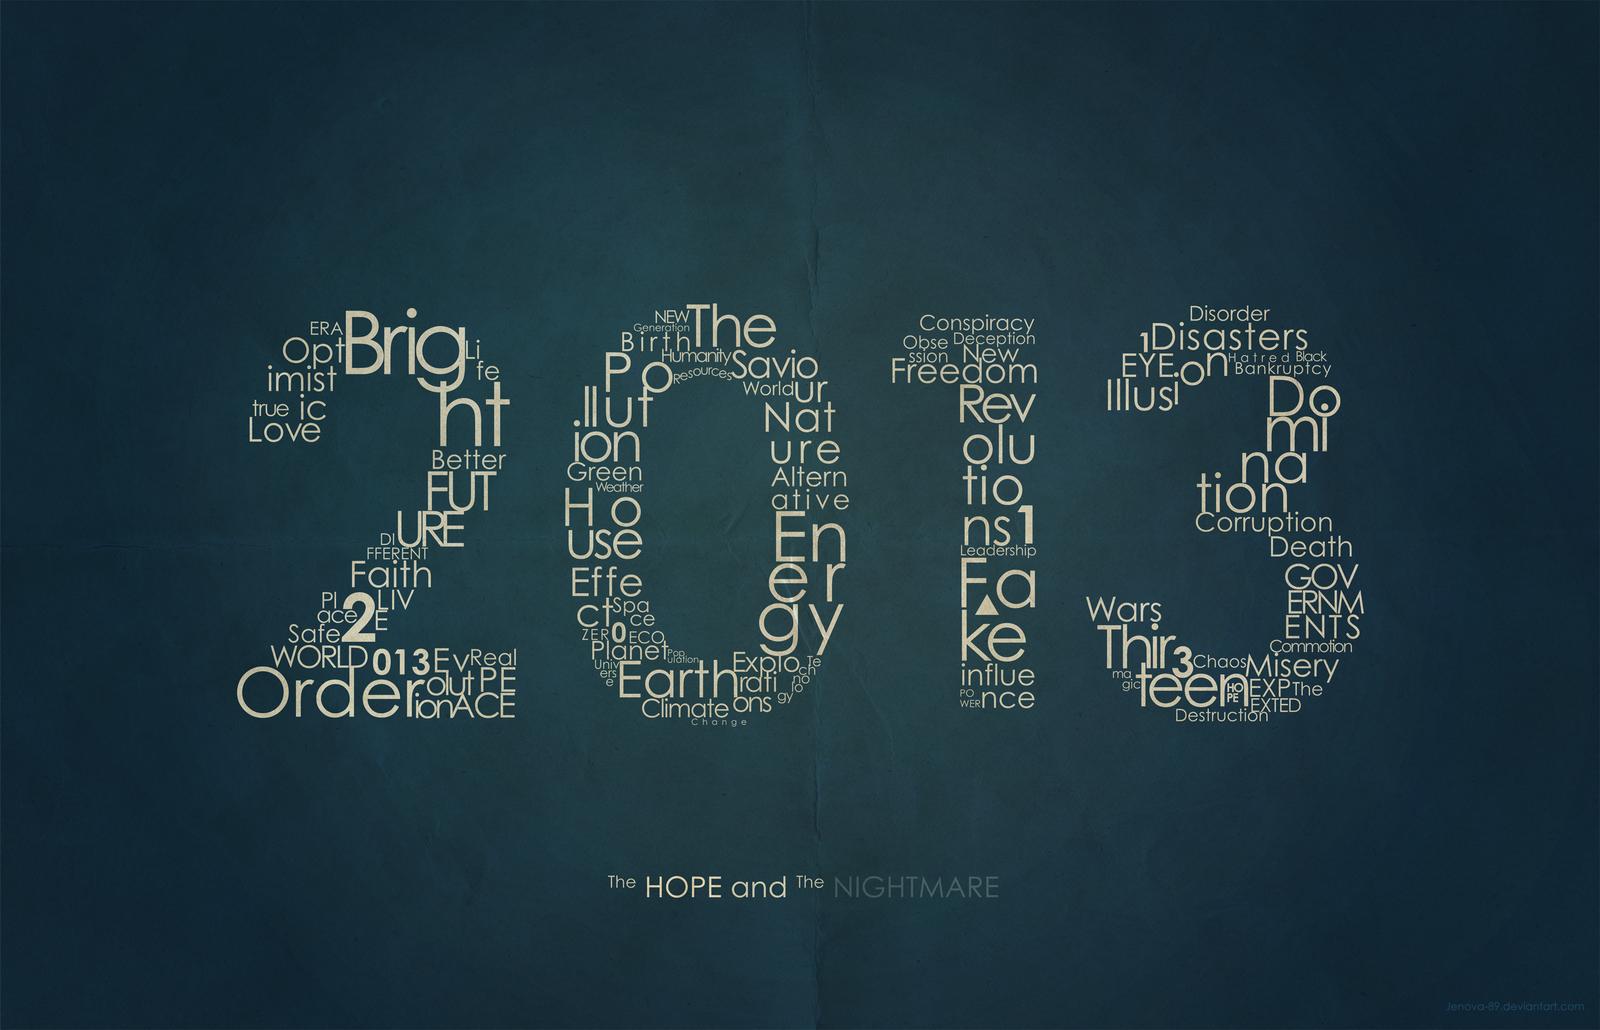 2013: Encoded by Jenova-89